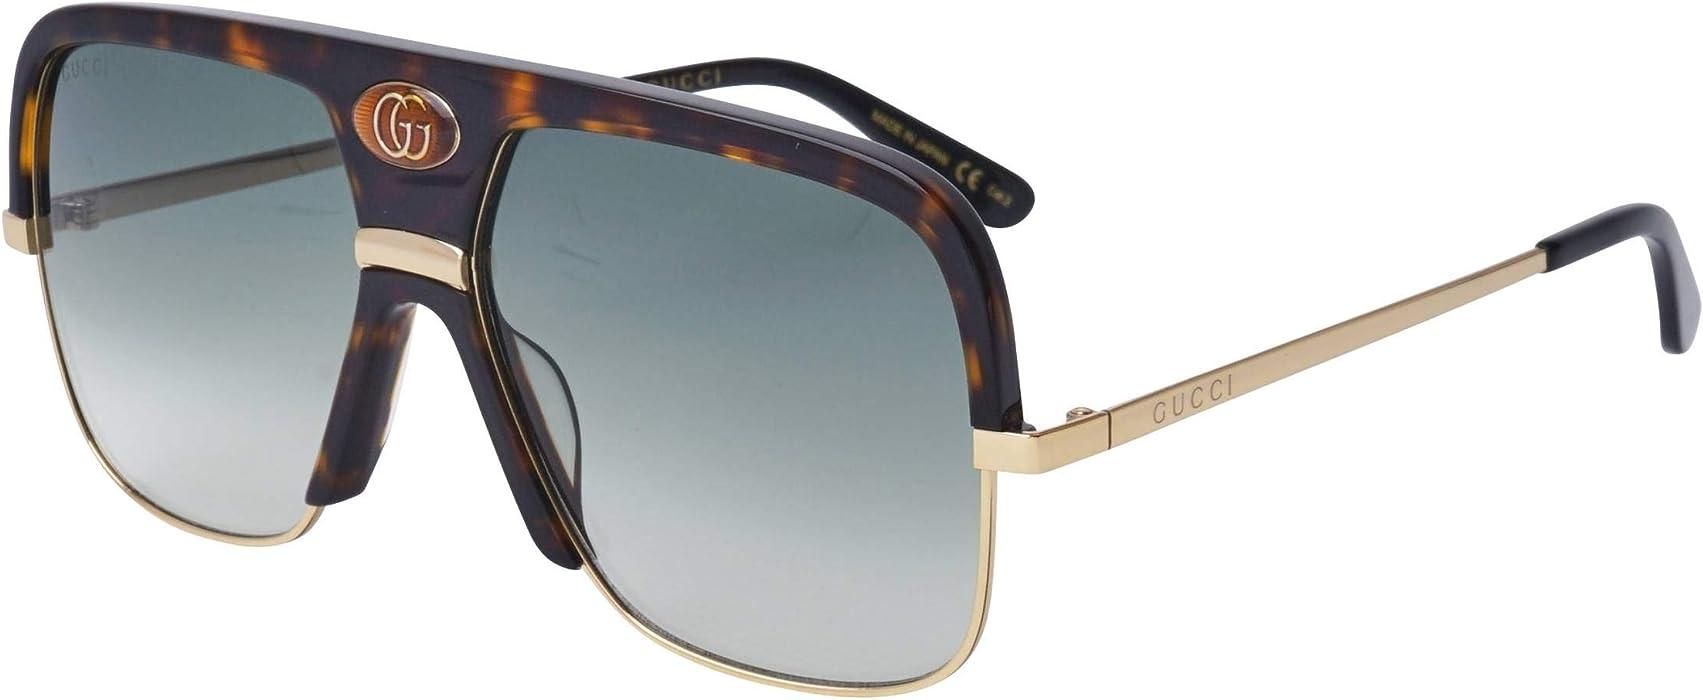 7ff415f86c Amazon.com  Sunglasses Gucci GG 0478 S- 002 HAVANA GREEN GOLD  Clothing